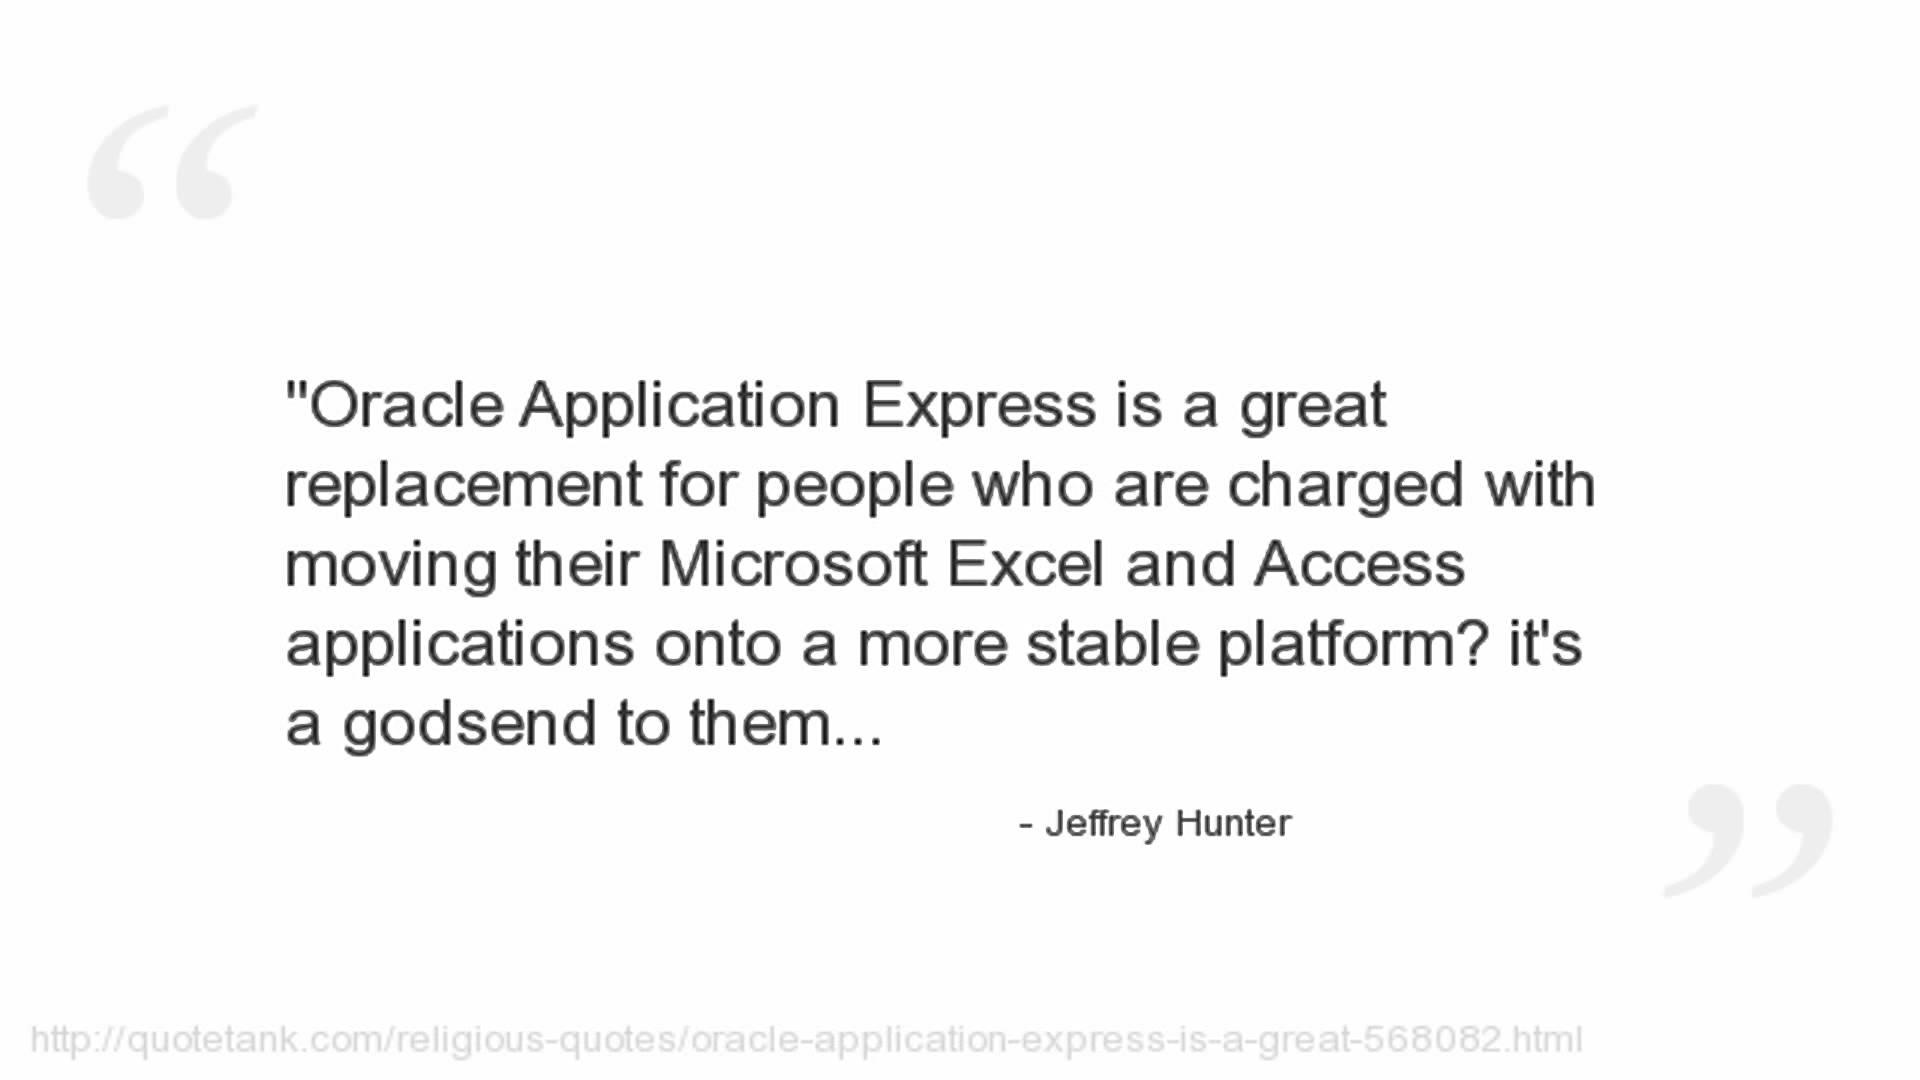 Jeffrey Hunter's quote #2